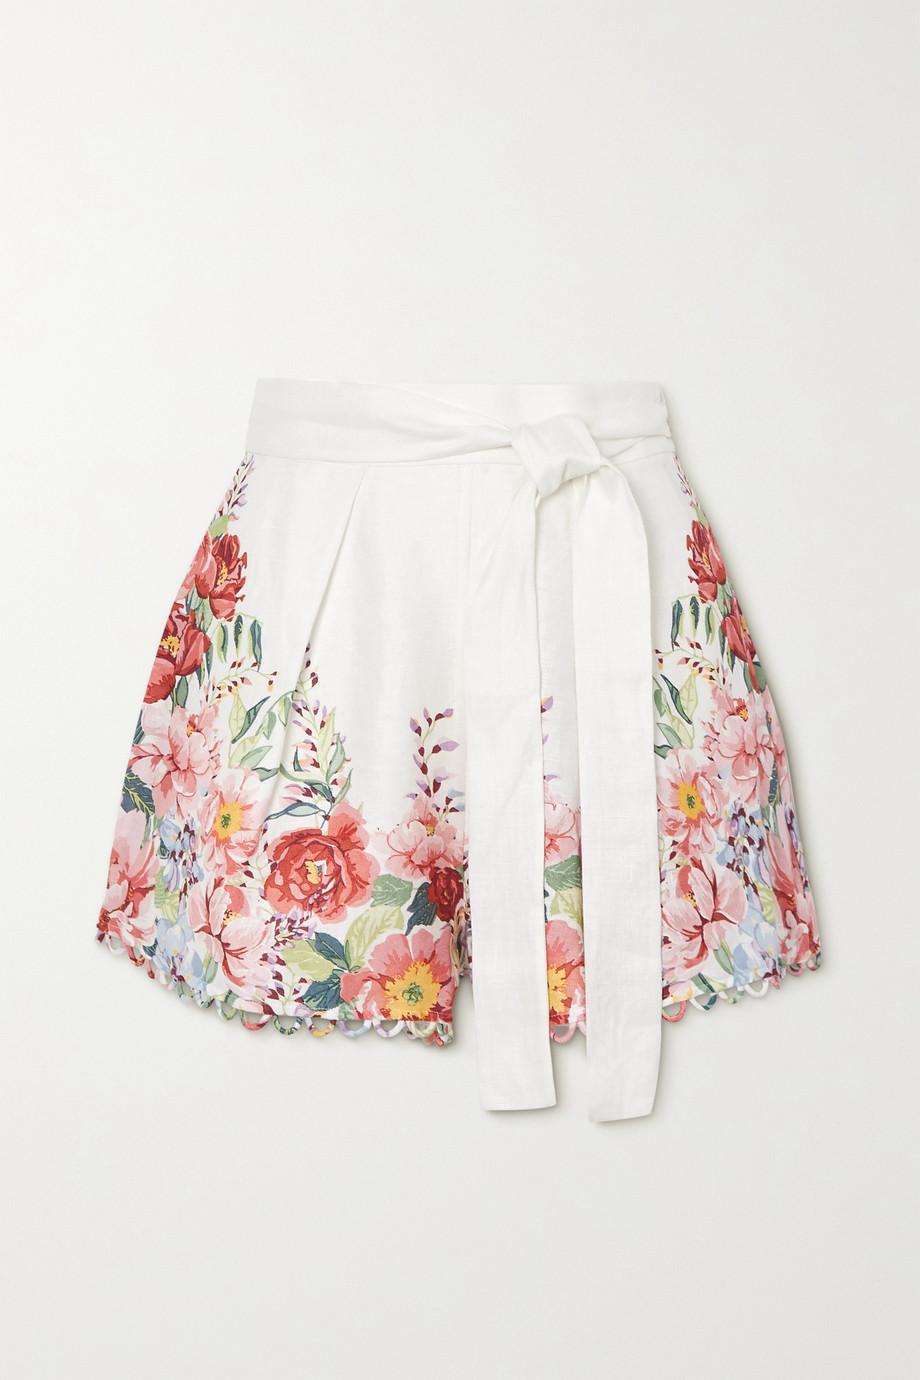 Zimmermann Bellitude 花卉印花亚麻短裤